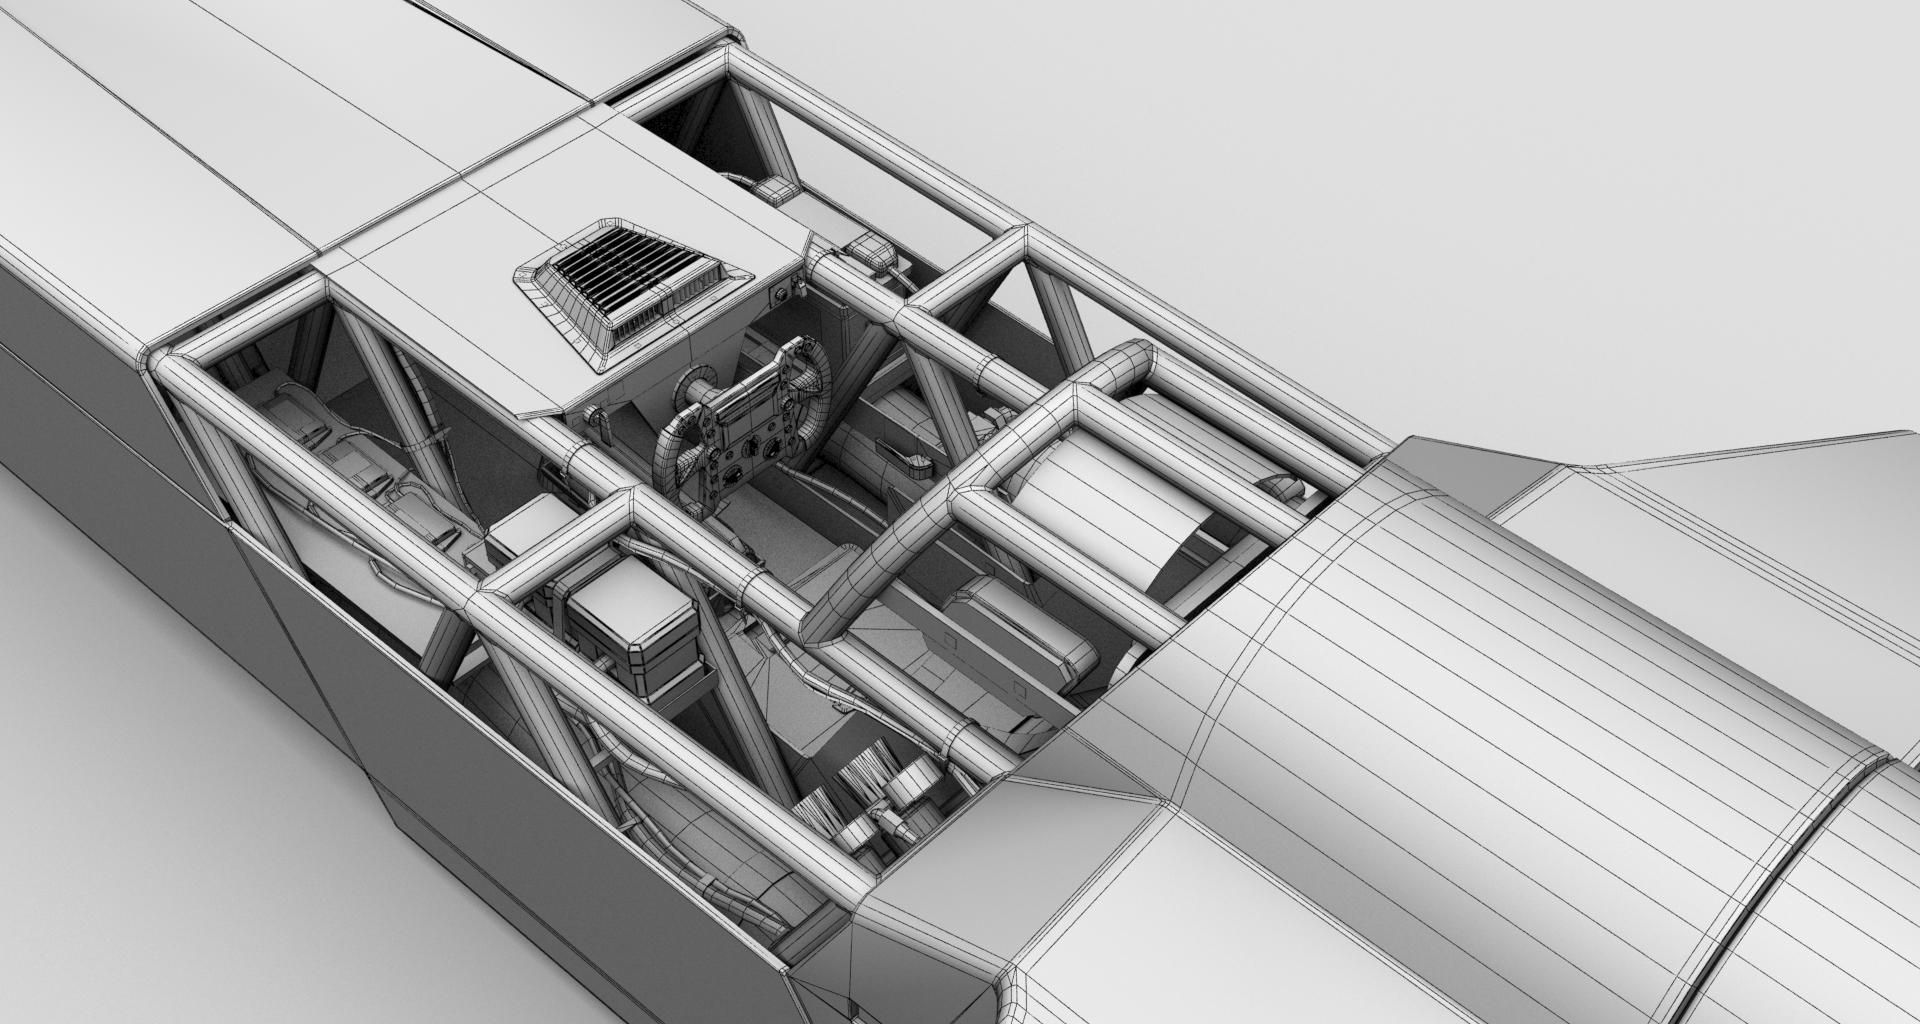 2012-10_The Crew_F.Beudin_Rocket-Car_AO_Cockpit_01